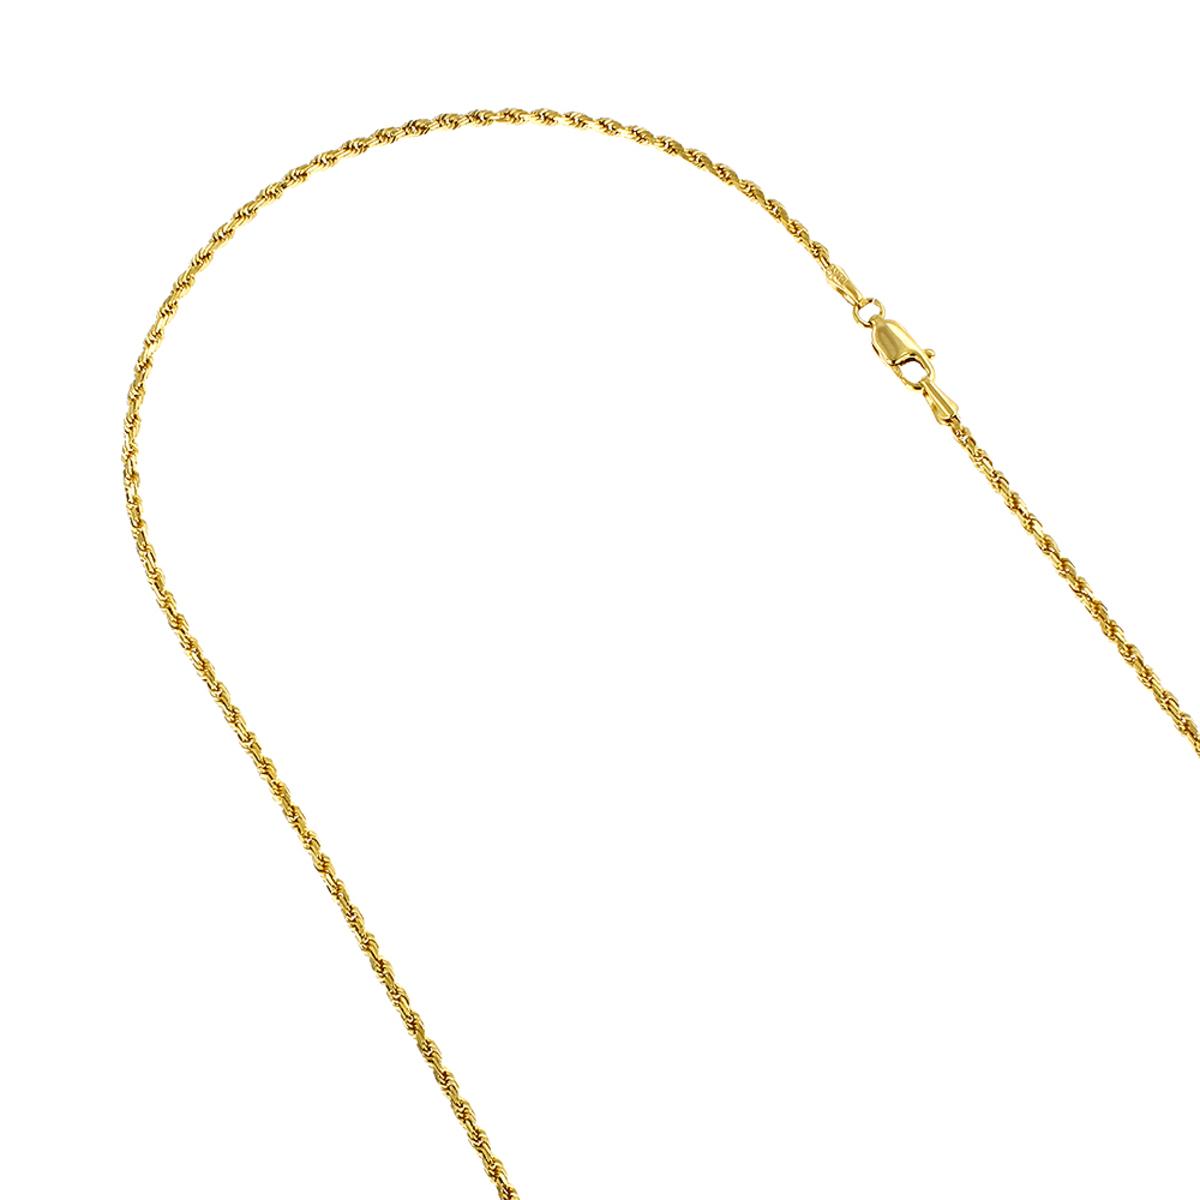 LUXURMAN Solid 14k Gold Rope Chain For Men & Women 1.5mm Wide